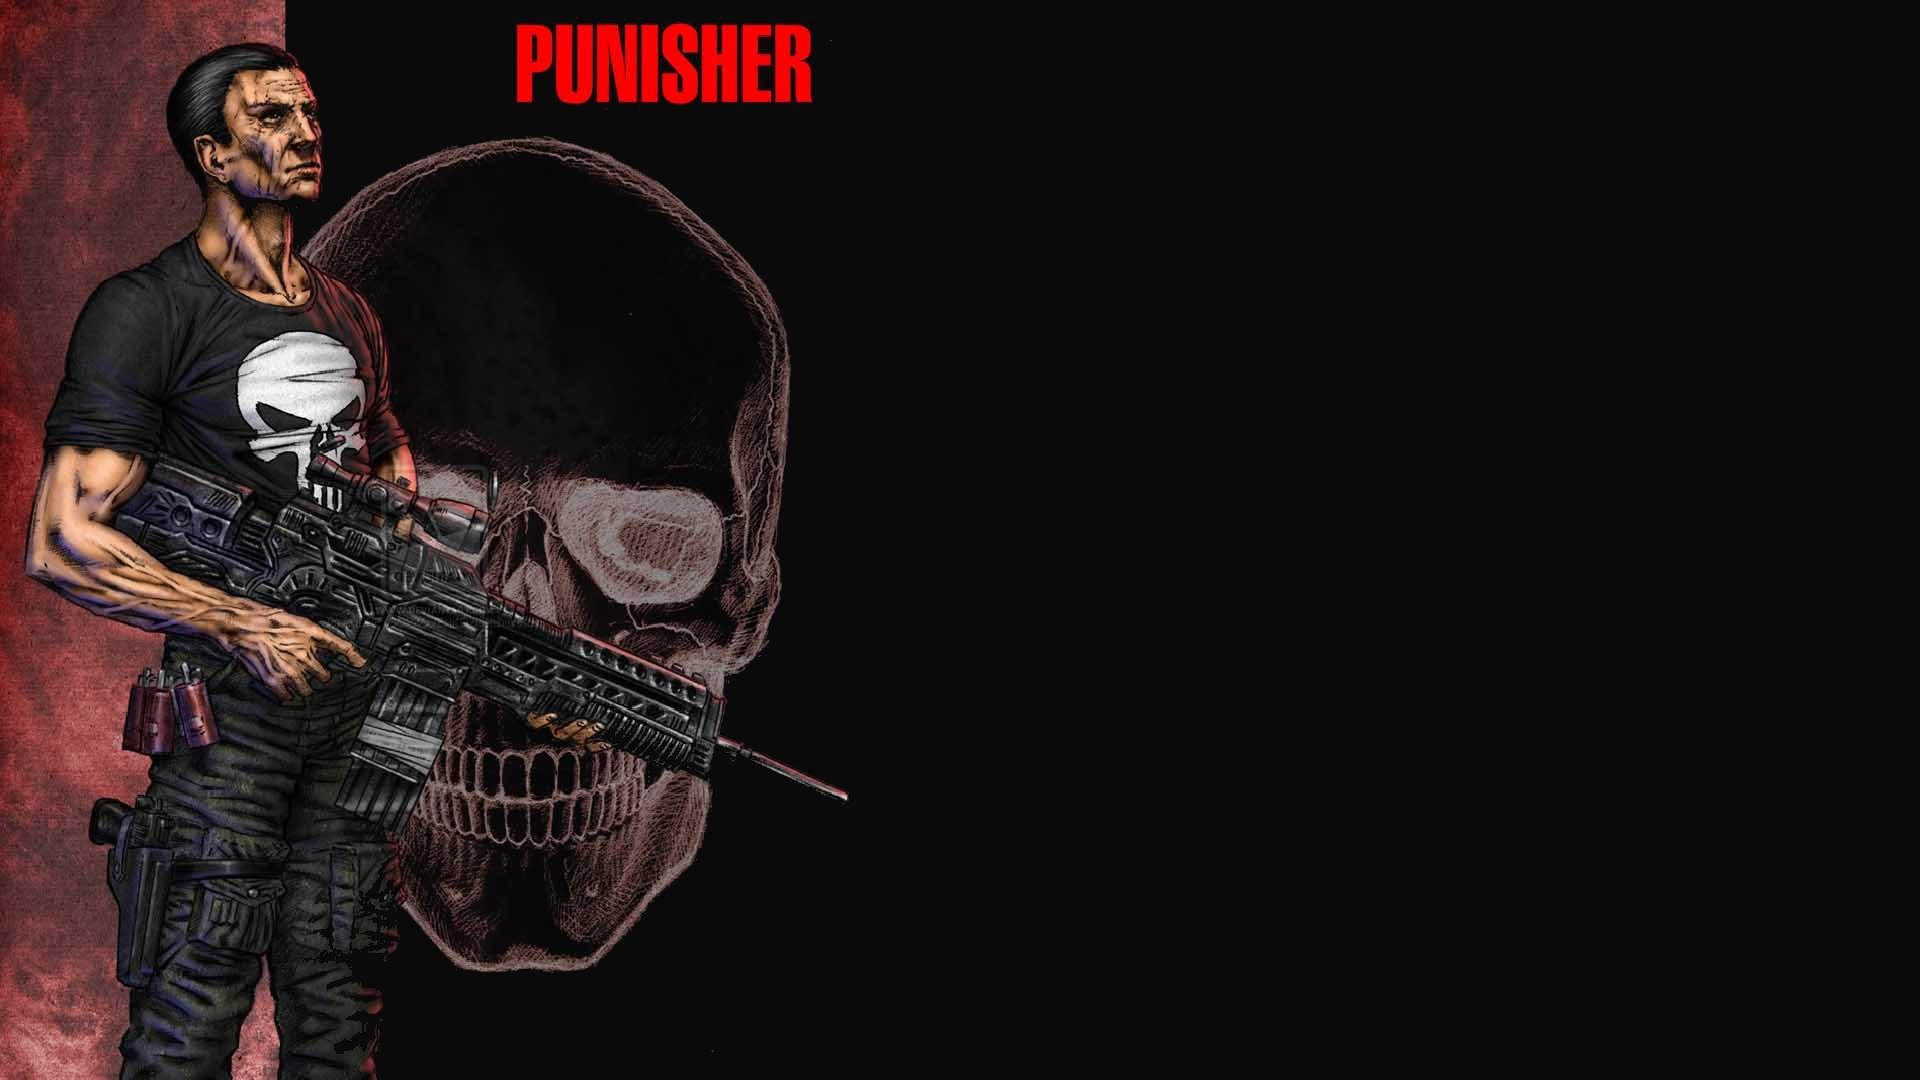 ... the punisher wallpaper free the punisher desktop wallpaper download